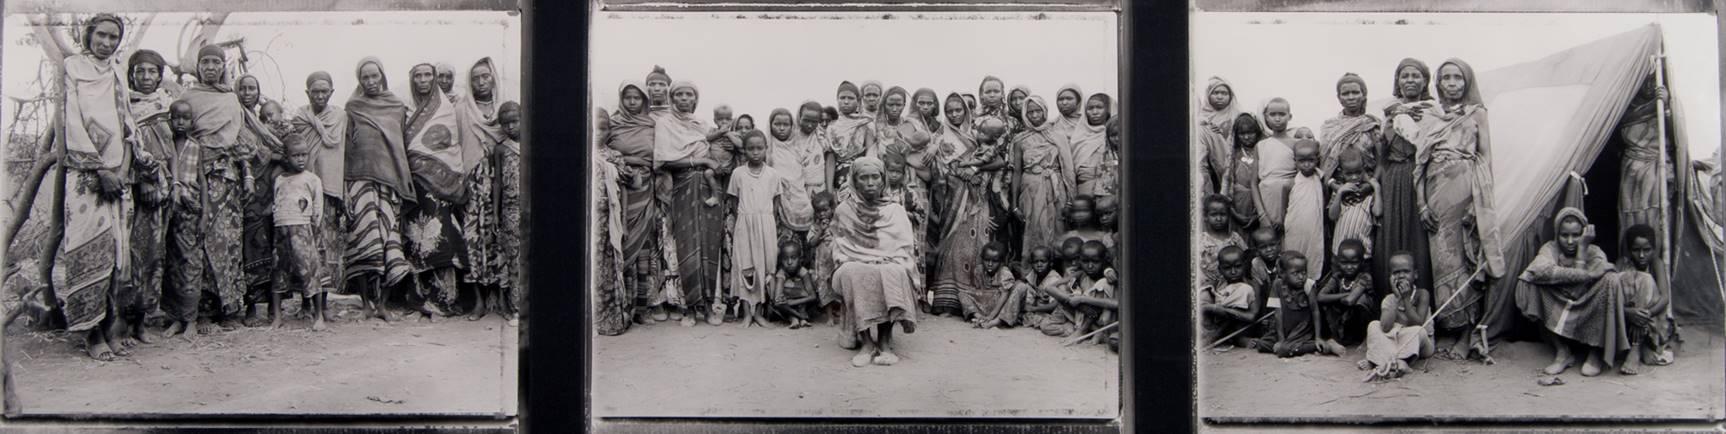 Fazal Sheikh  (American, b. 1965)  Gabbra Matriarch, Seated at Center, with Gabbra Women and Children,  1993